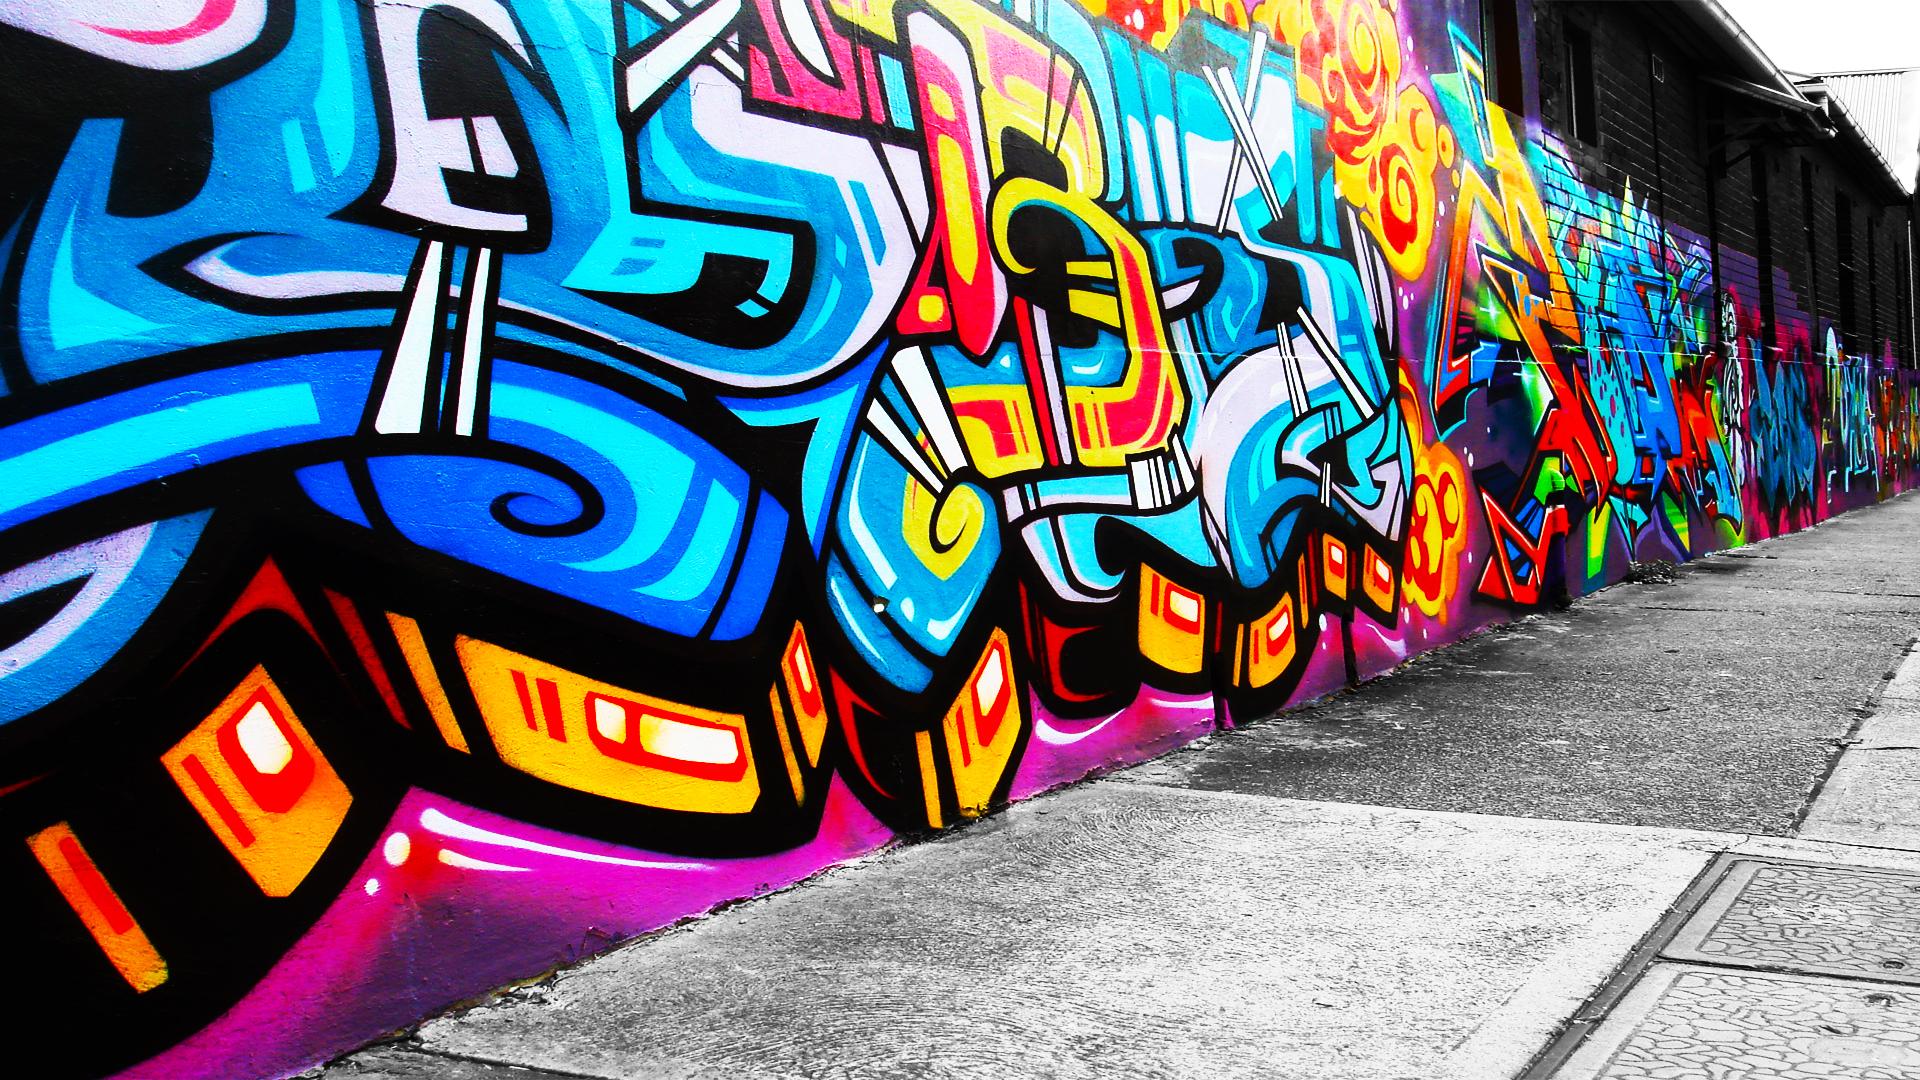 Wallpaper Of Graffiti